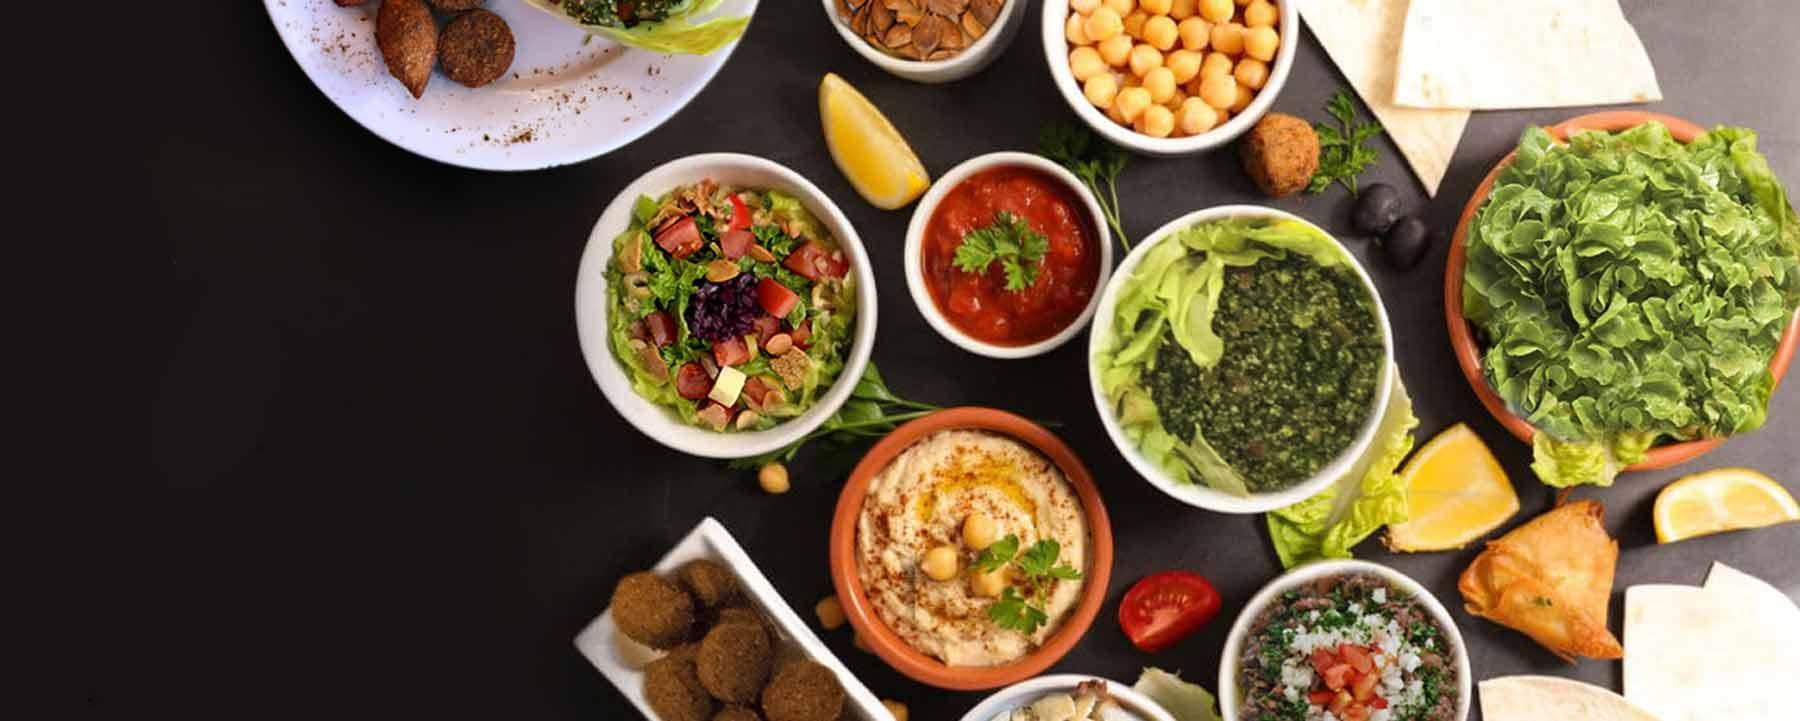 comidalibanesa2.jpg